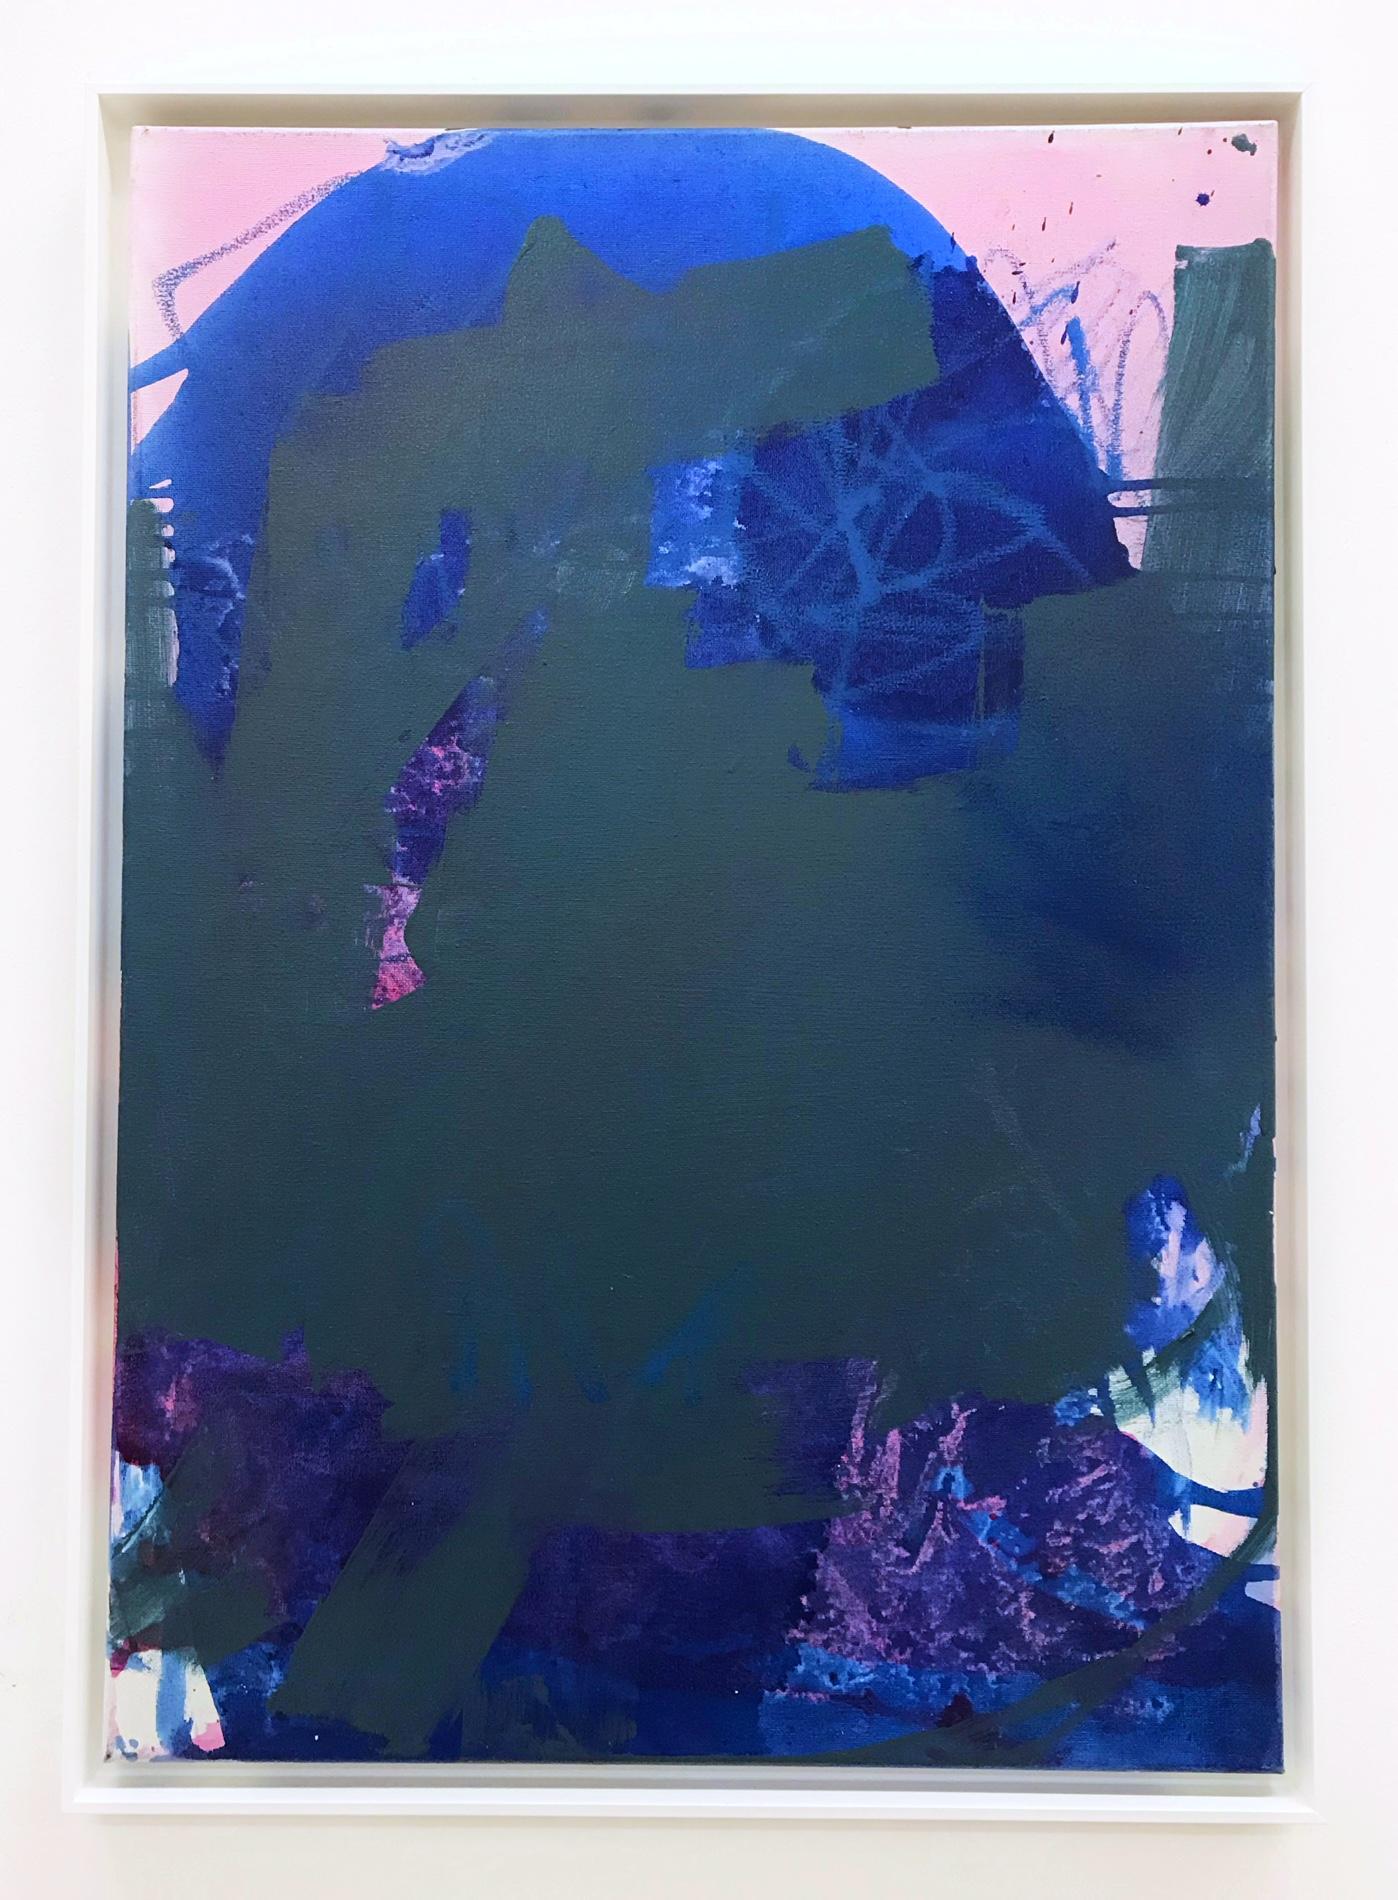 Indulgence - Expressive painting, abstract art, Contemporary Art, modern art